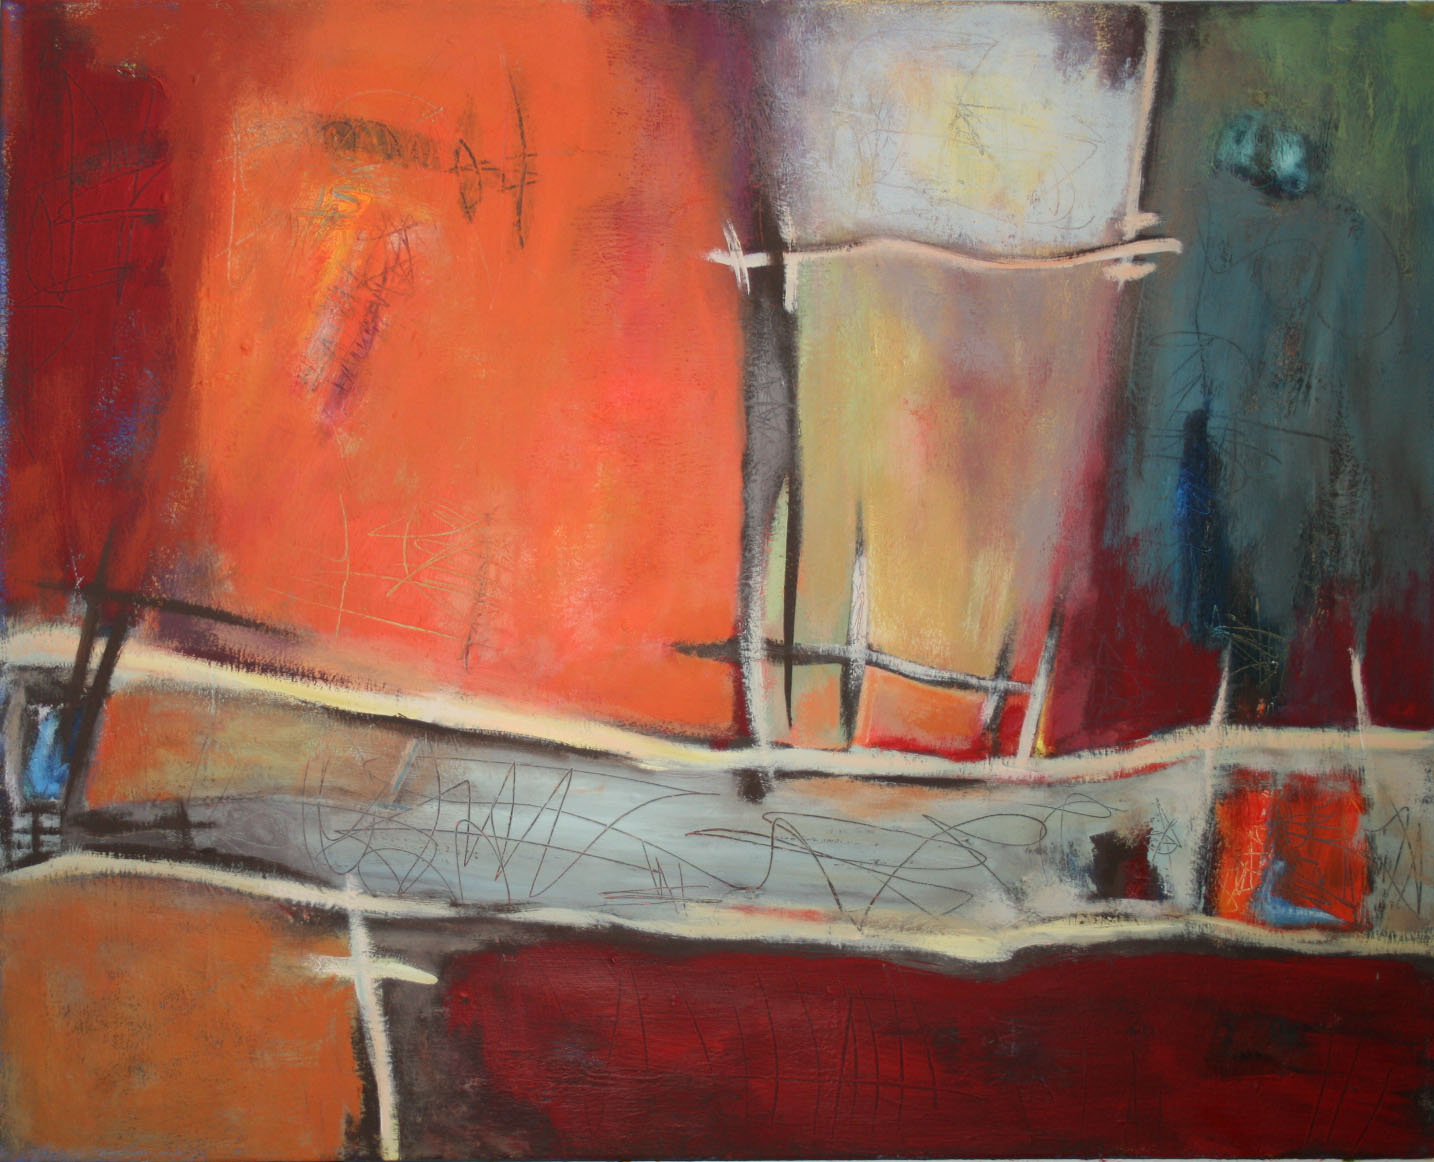 Neue Wege,  Öl und Acryl auf Leinwand, 80 x 100 cm